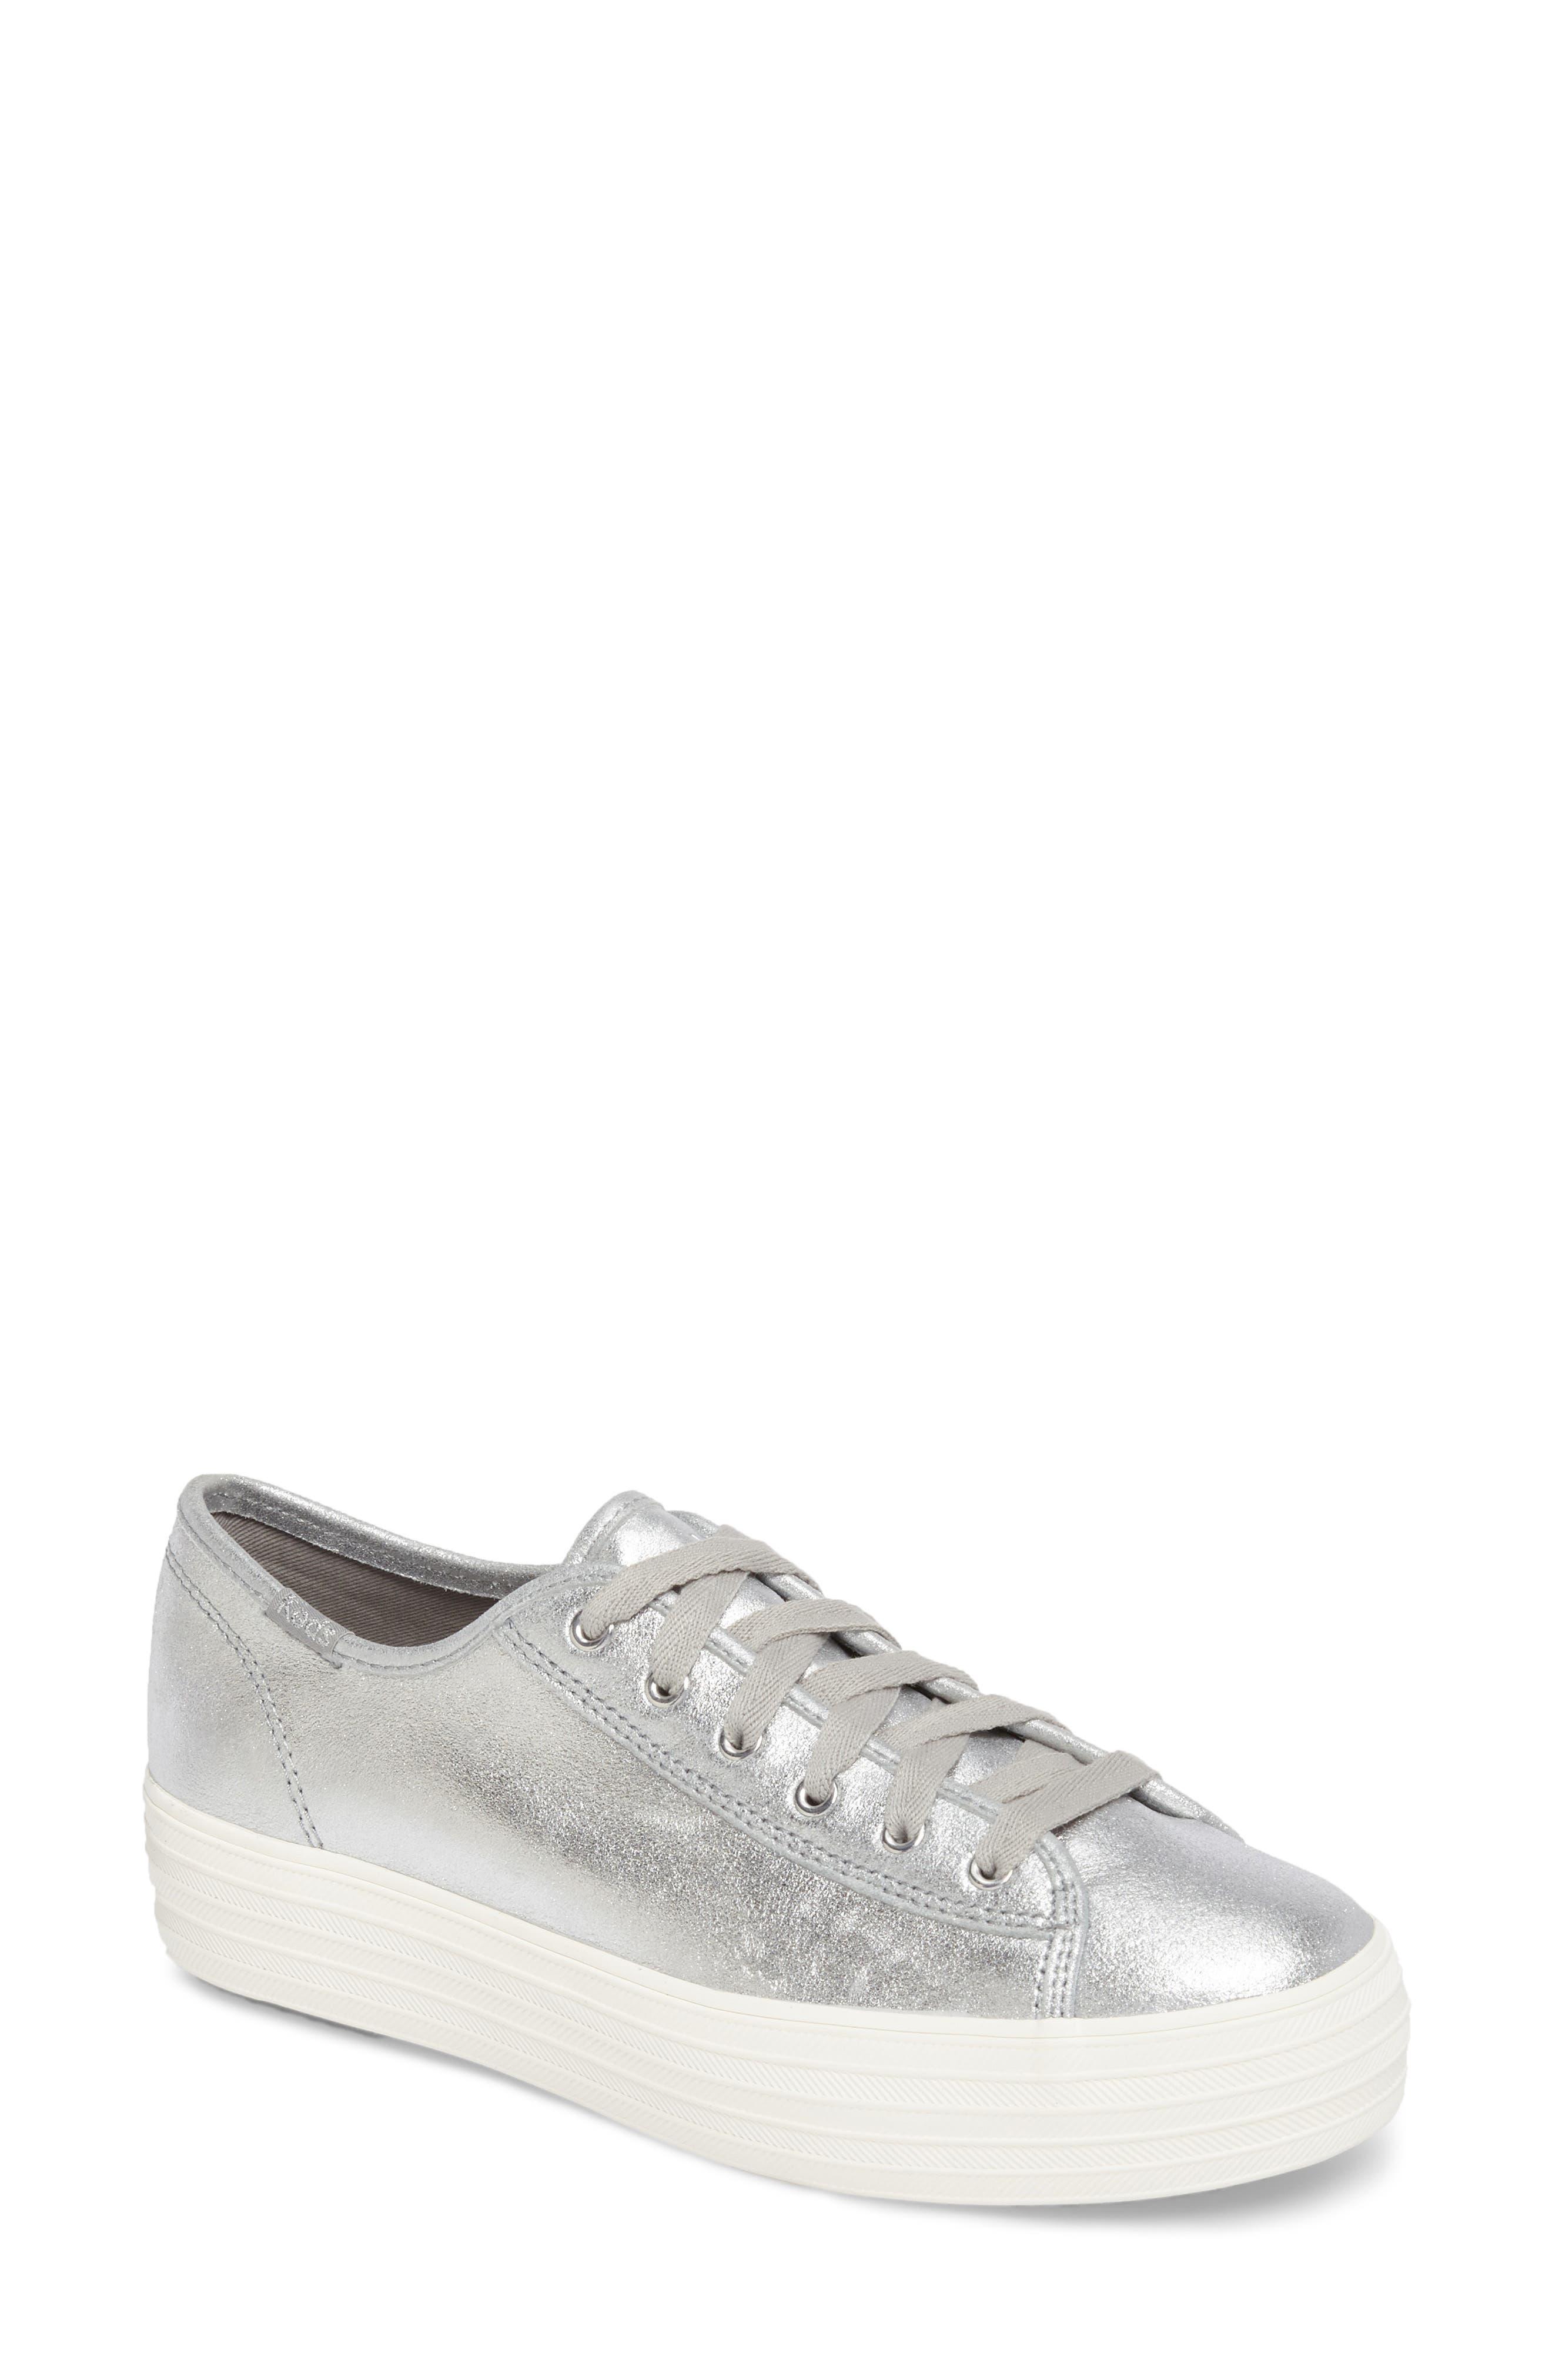 Triple Kick Platform Sneaker,                             Main thumbnail 1, color,                             Silver